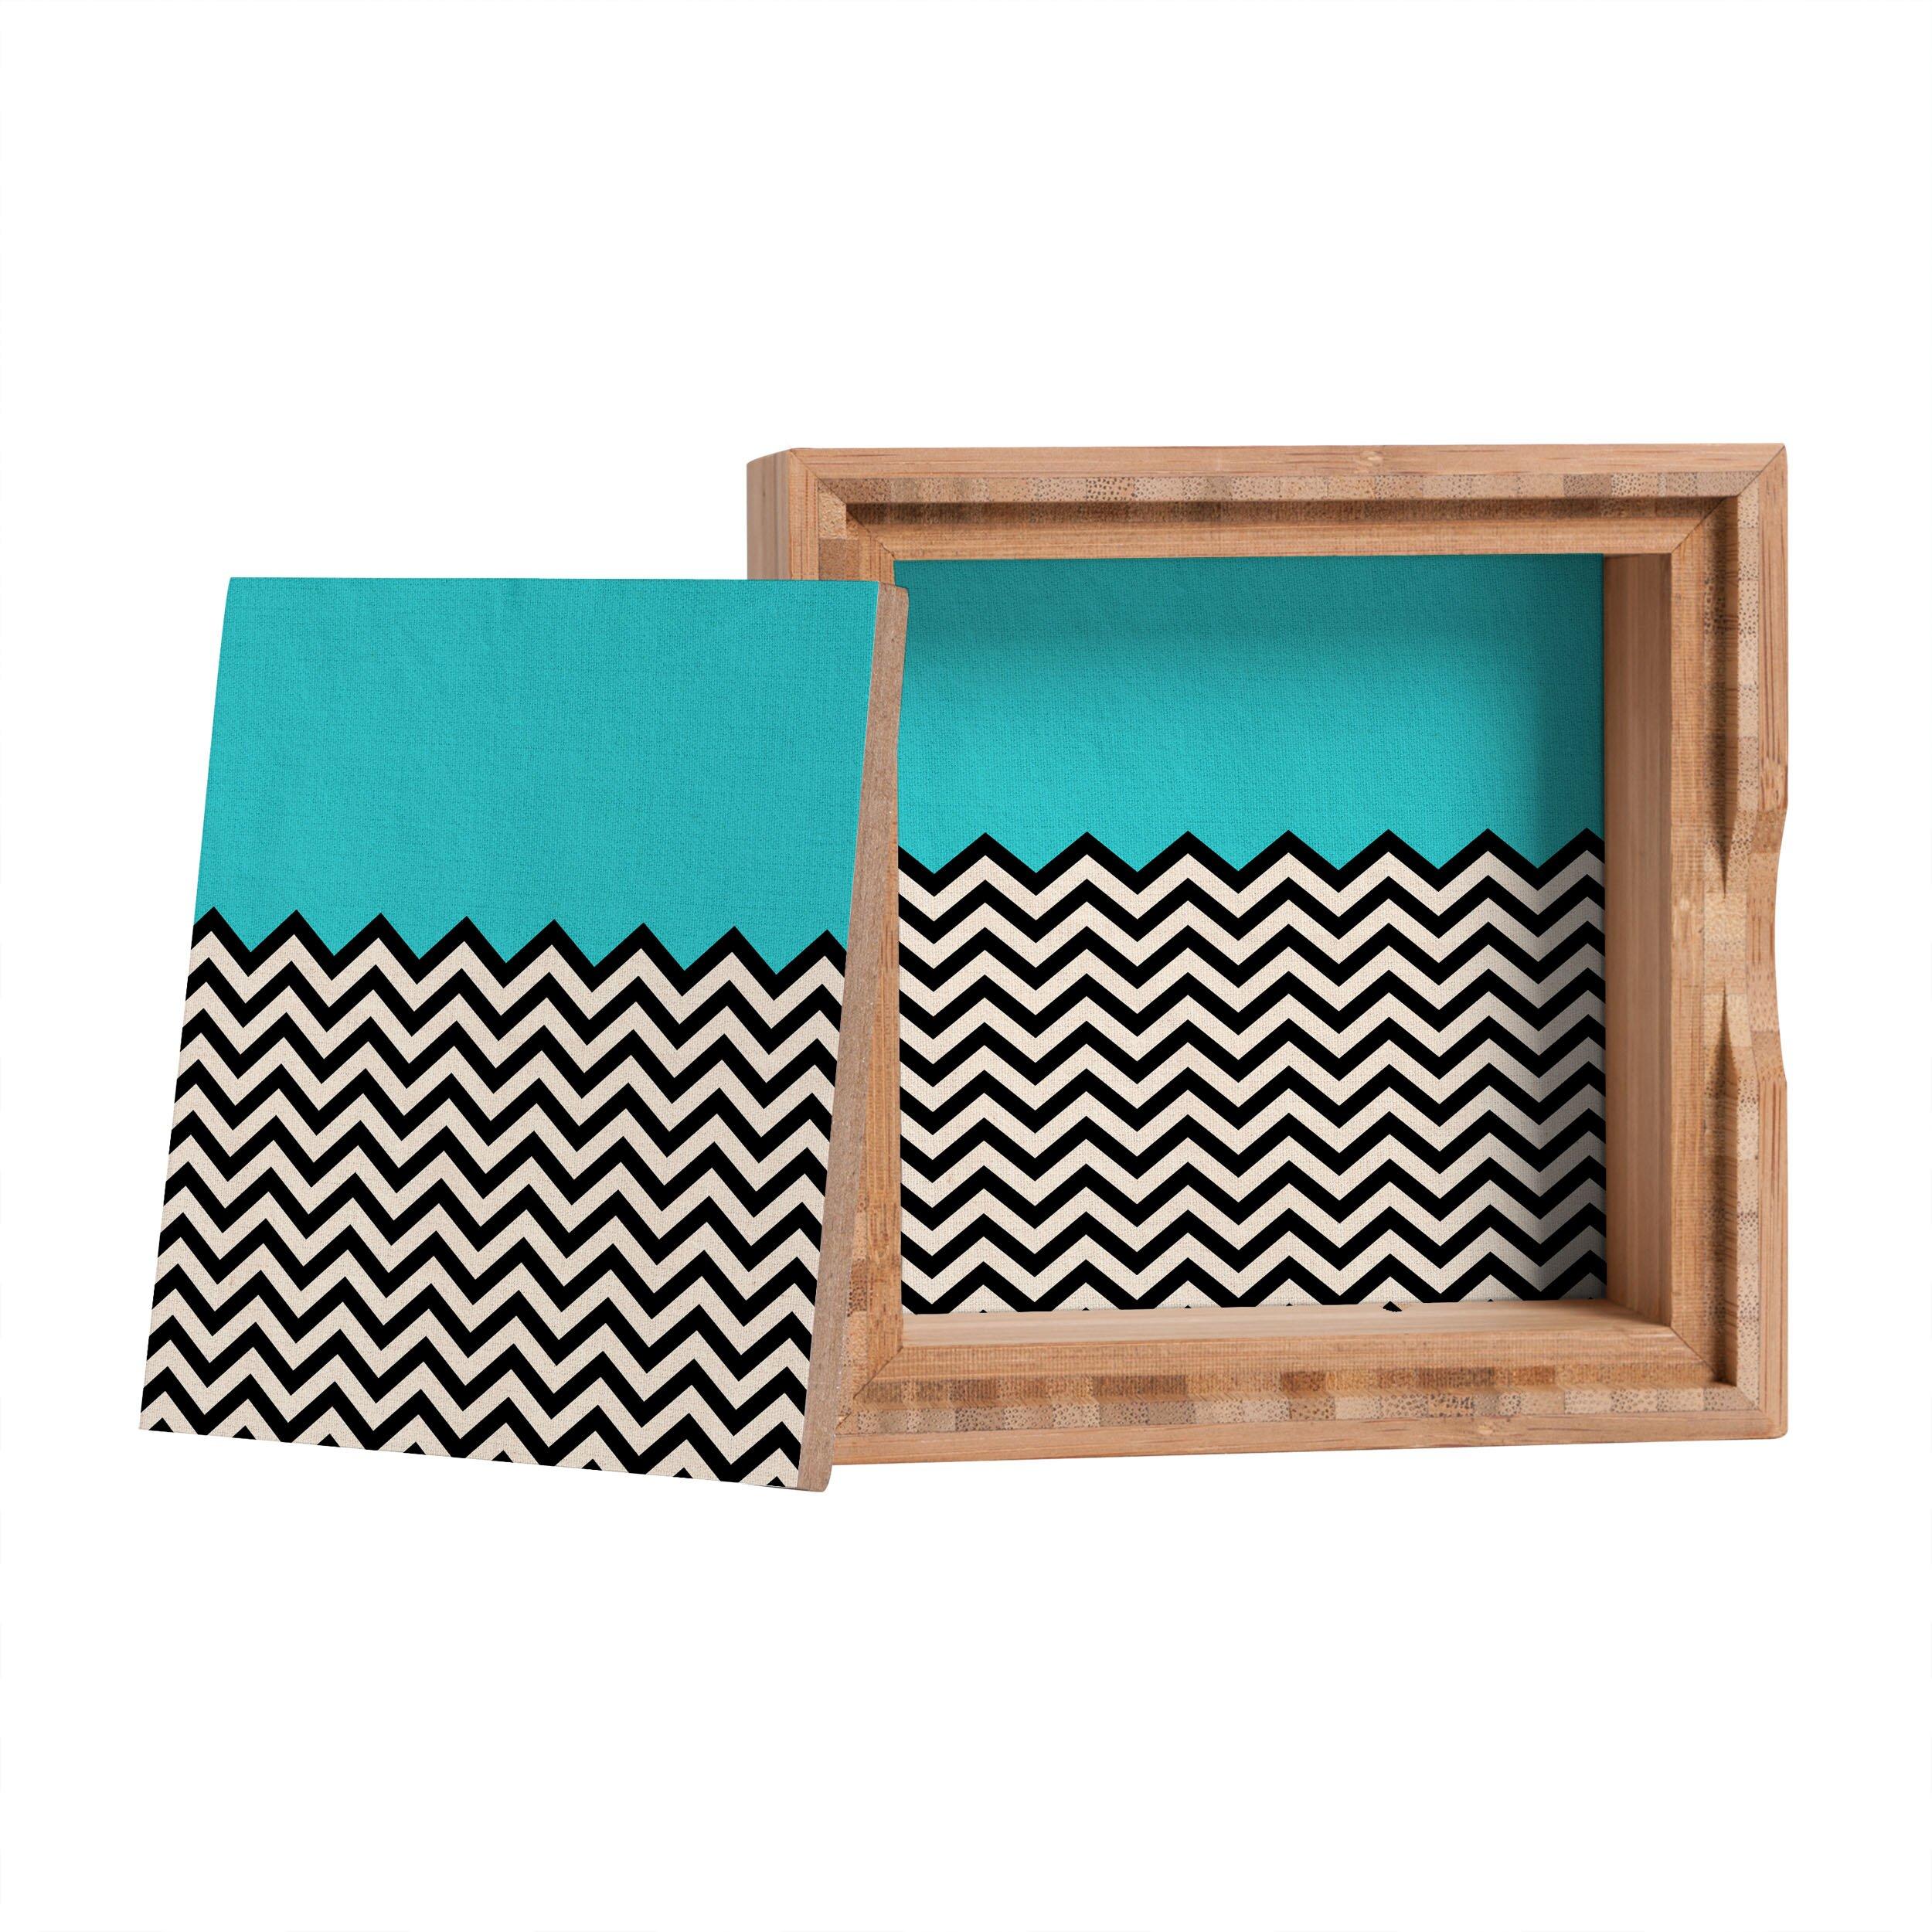 Deny designs bianca green follow the sky storage box amp reviews